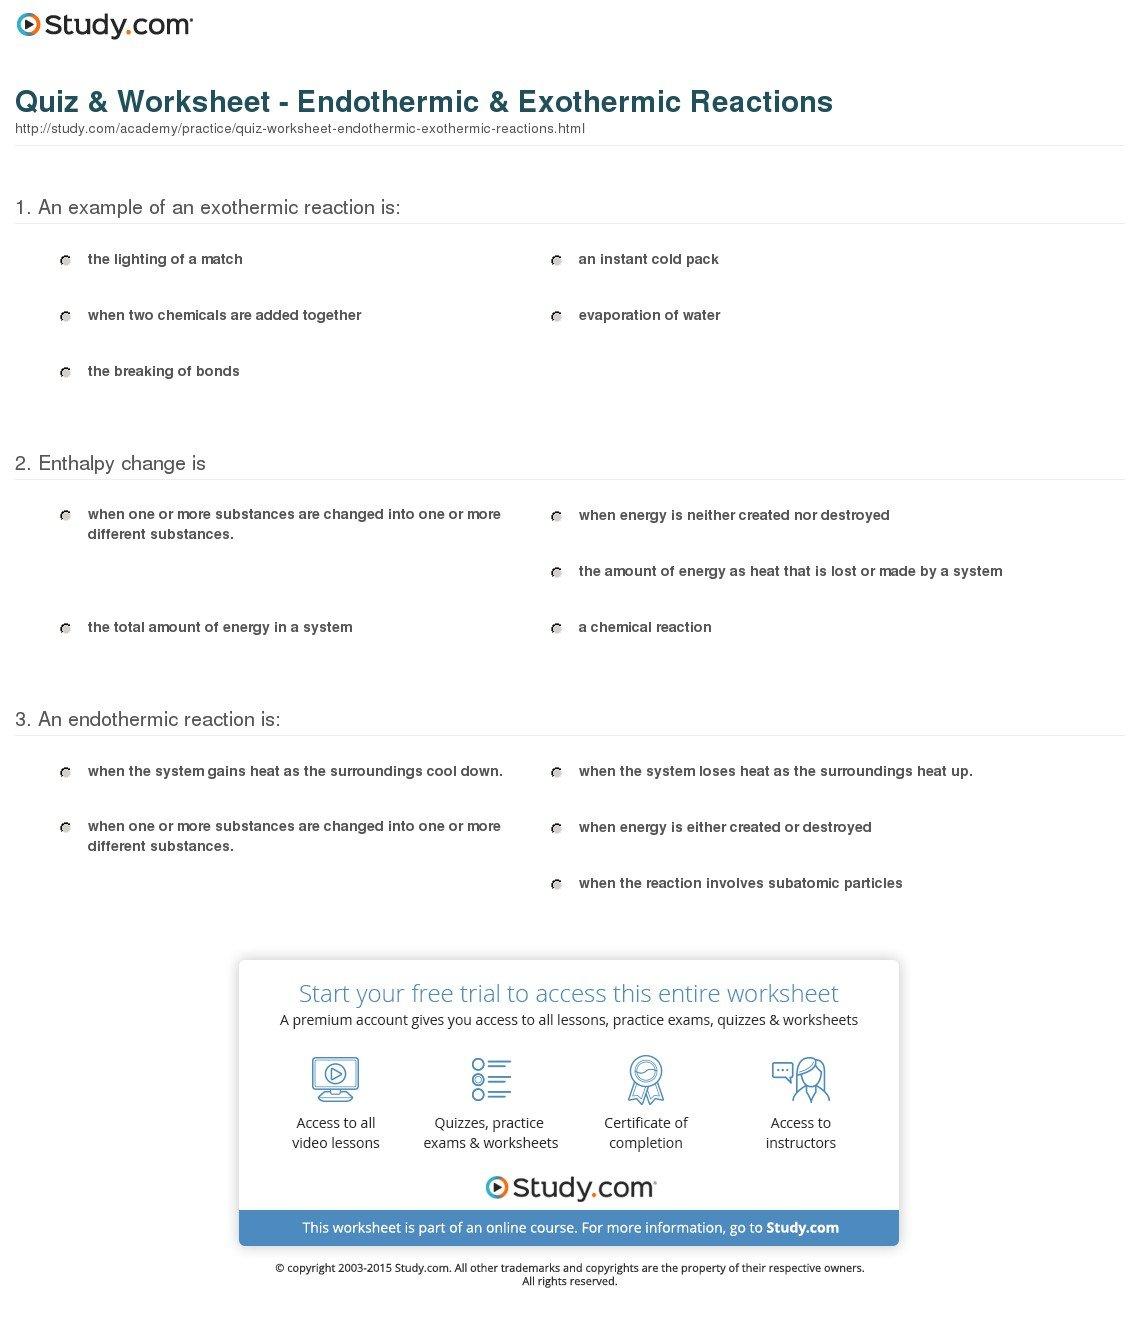 Quiz  Worksheet  Endothermic  Exothermic Reactions  Study Regarding Endothermic And Exothermic Reaction Worksheet Answers